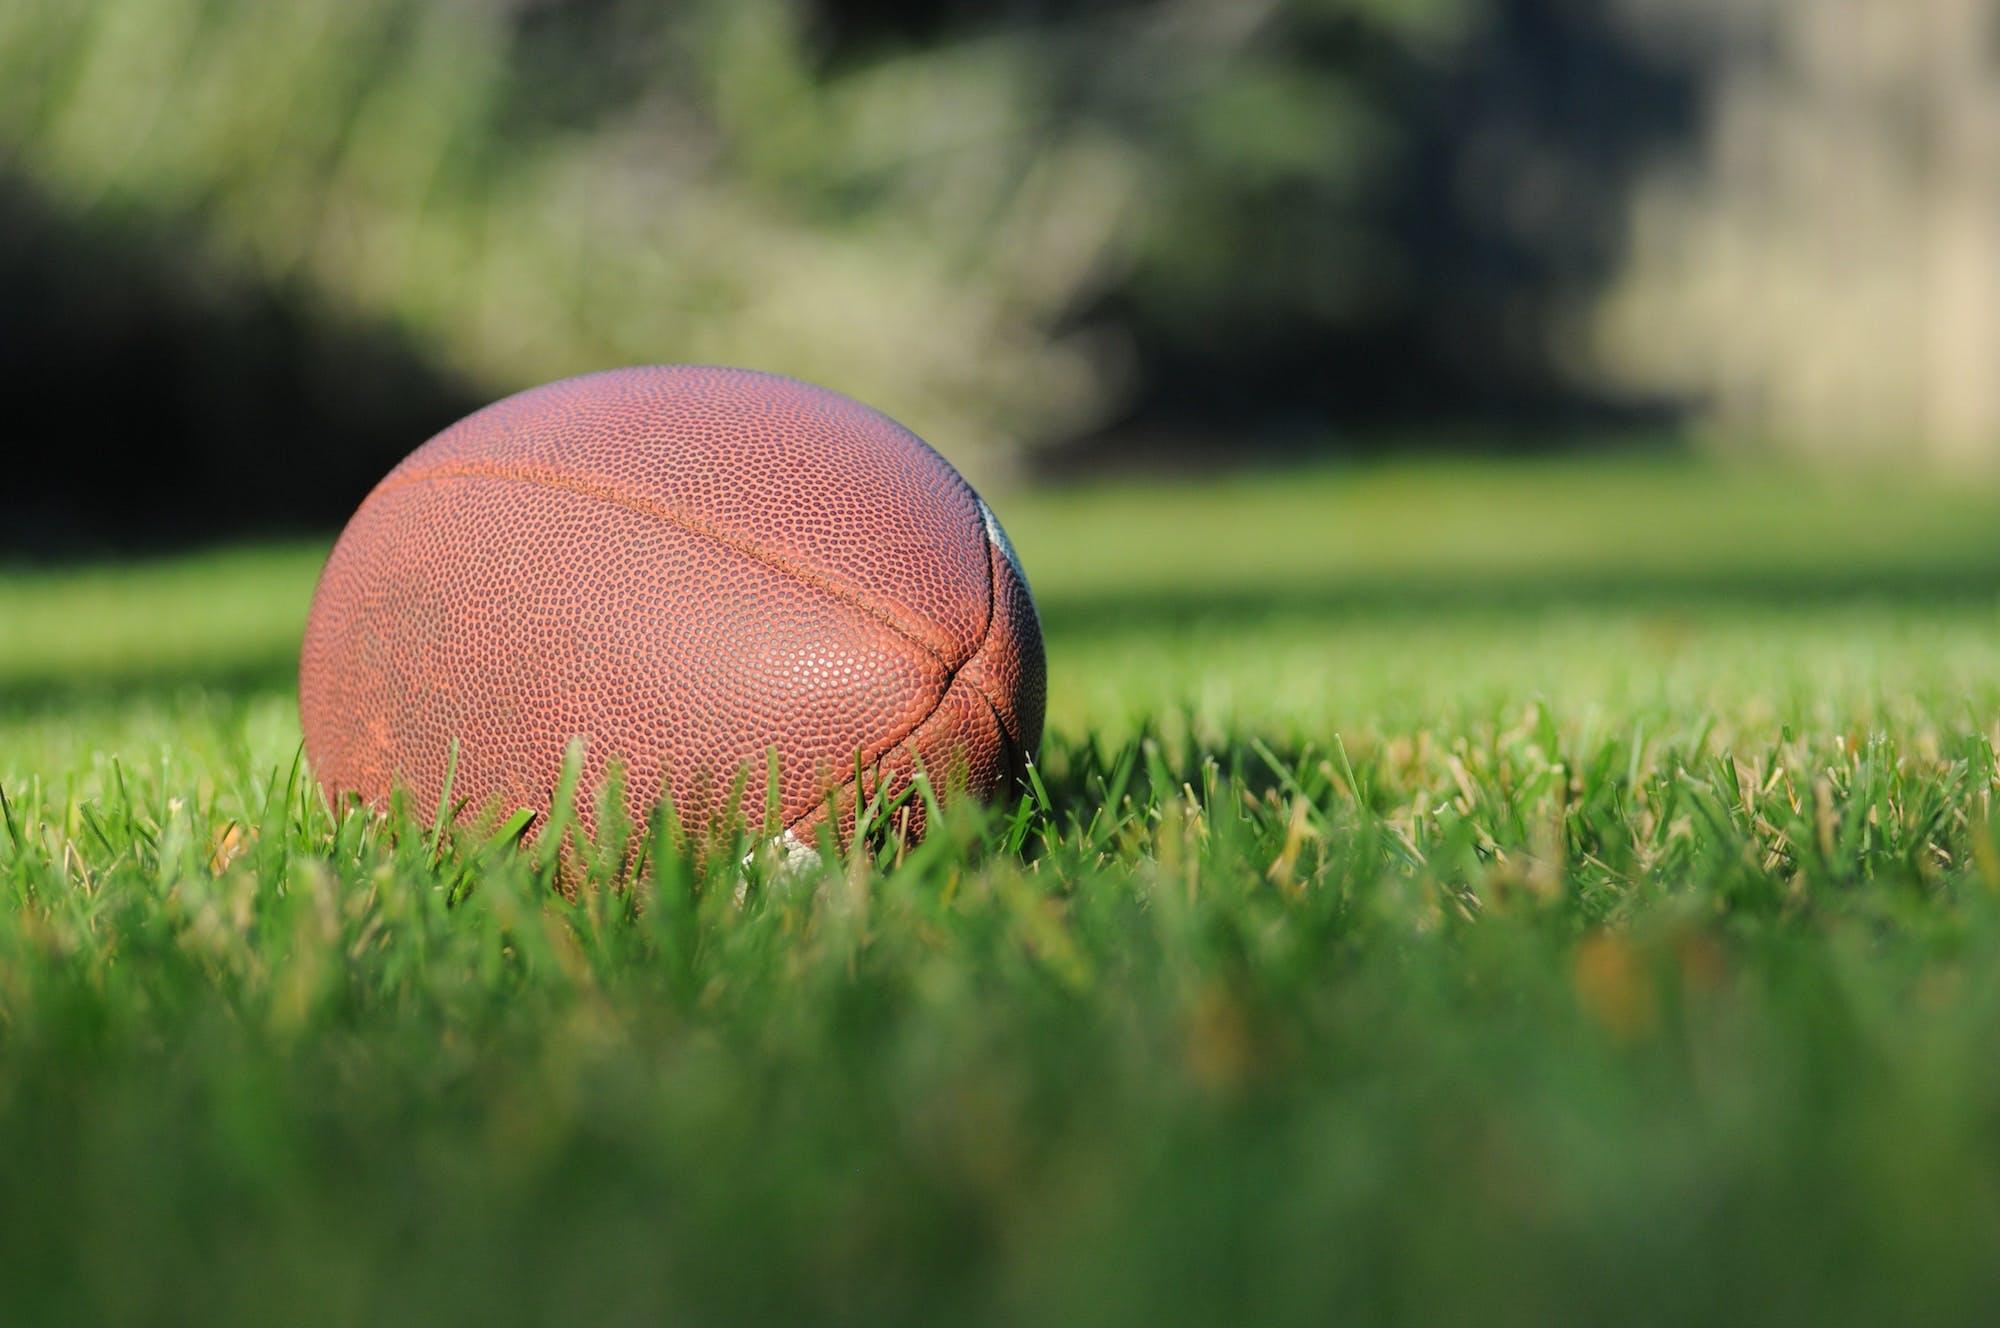 NFL's All-Time Scoring Record Has Just Been Broken! Adam Vinatieri Takes The Crown.